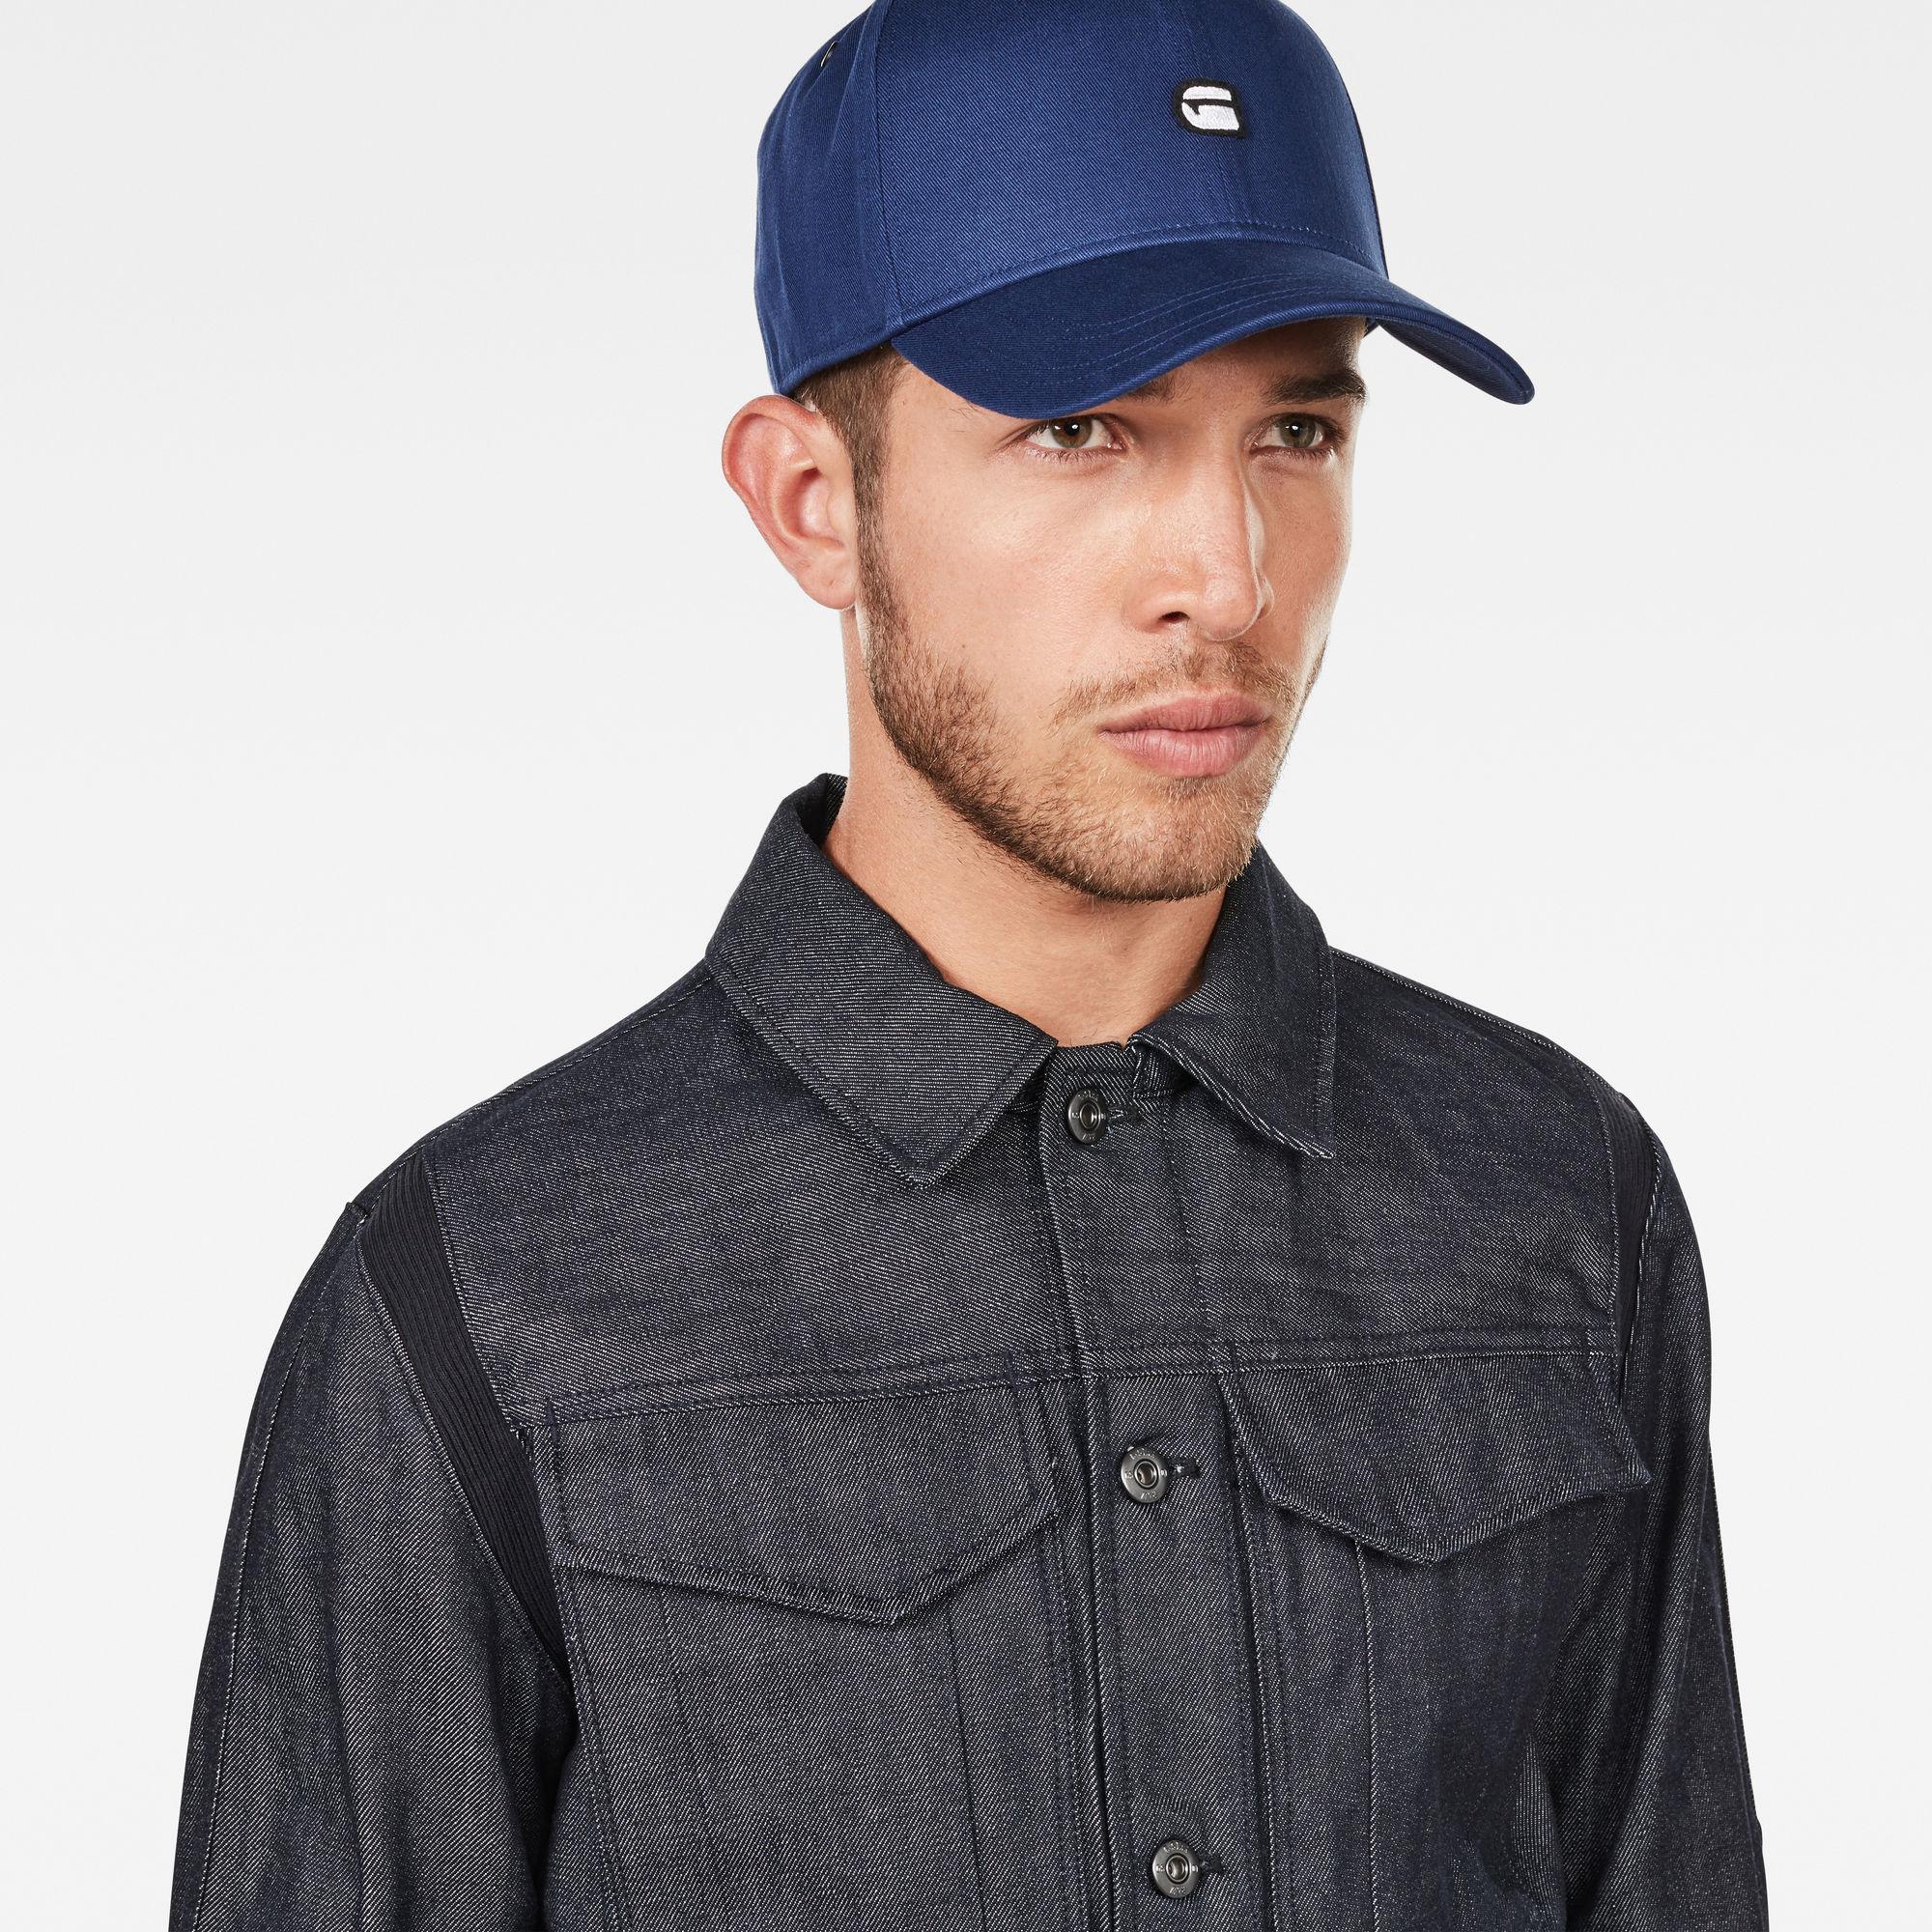 G-Star RAW Originals Baseball Cap